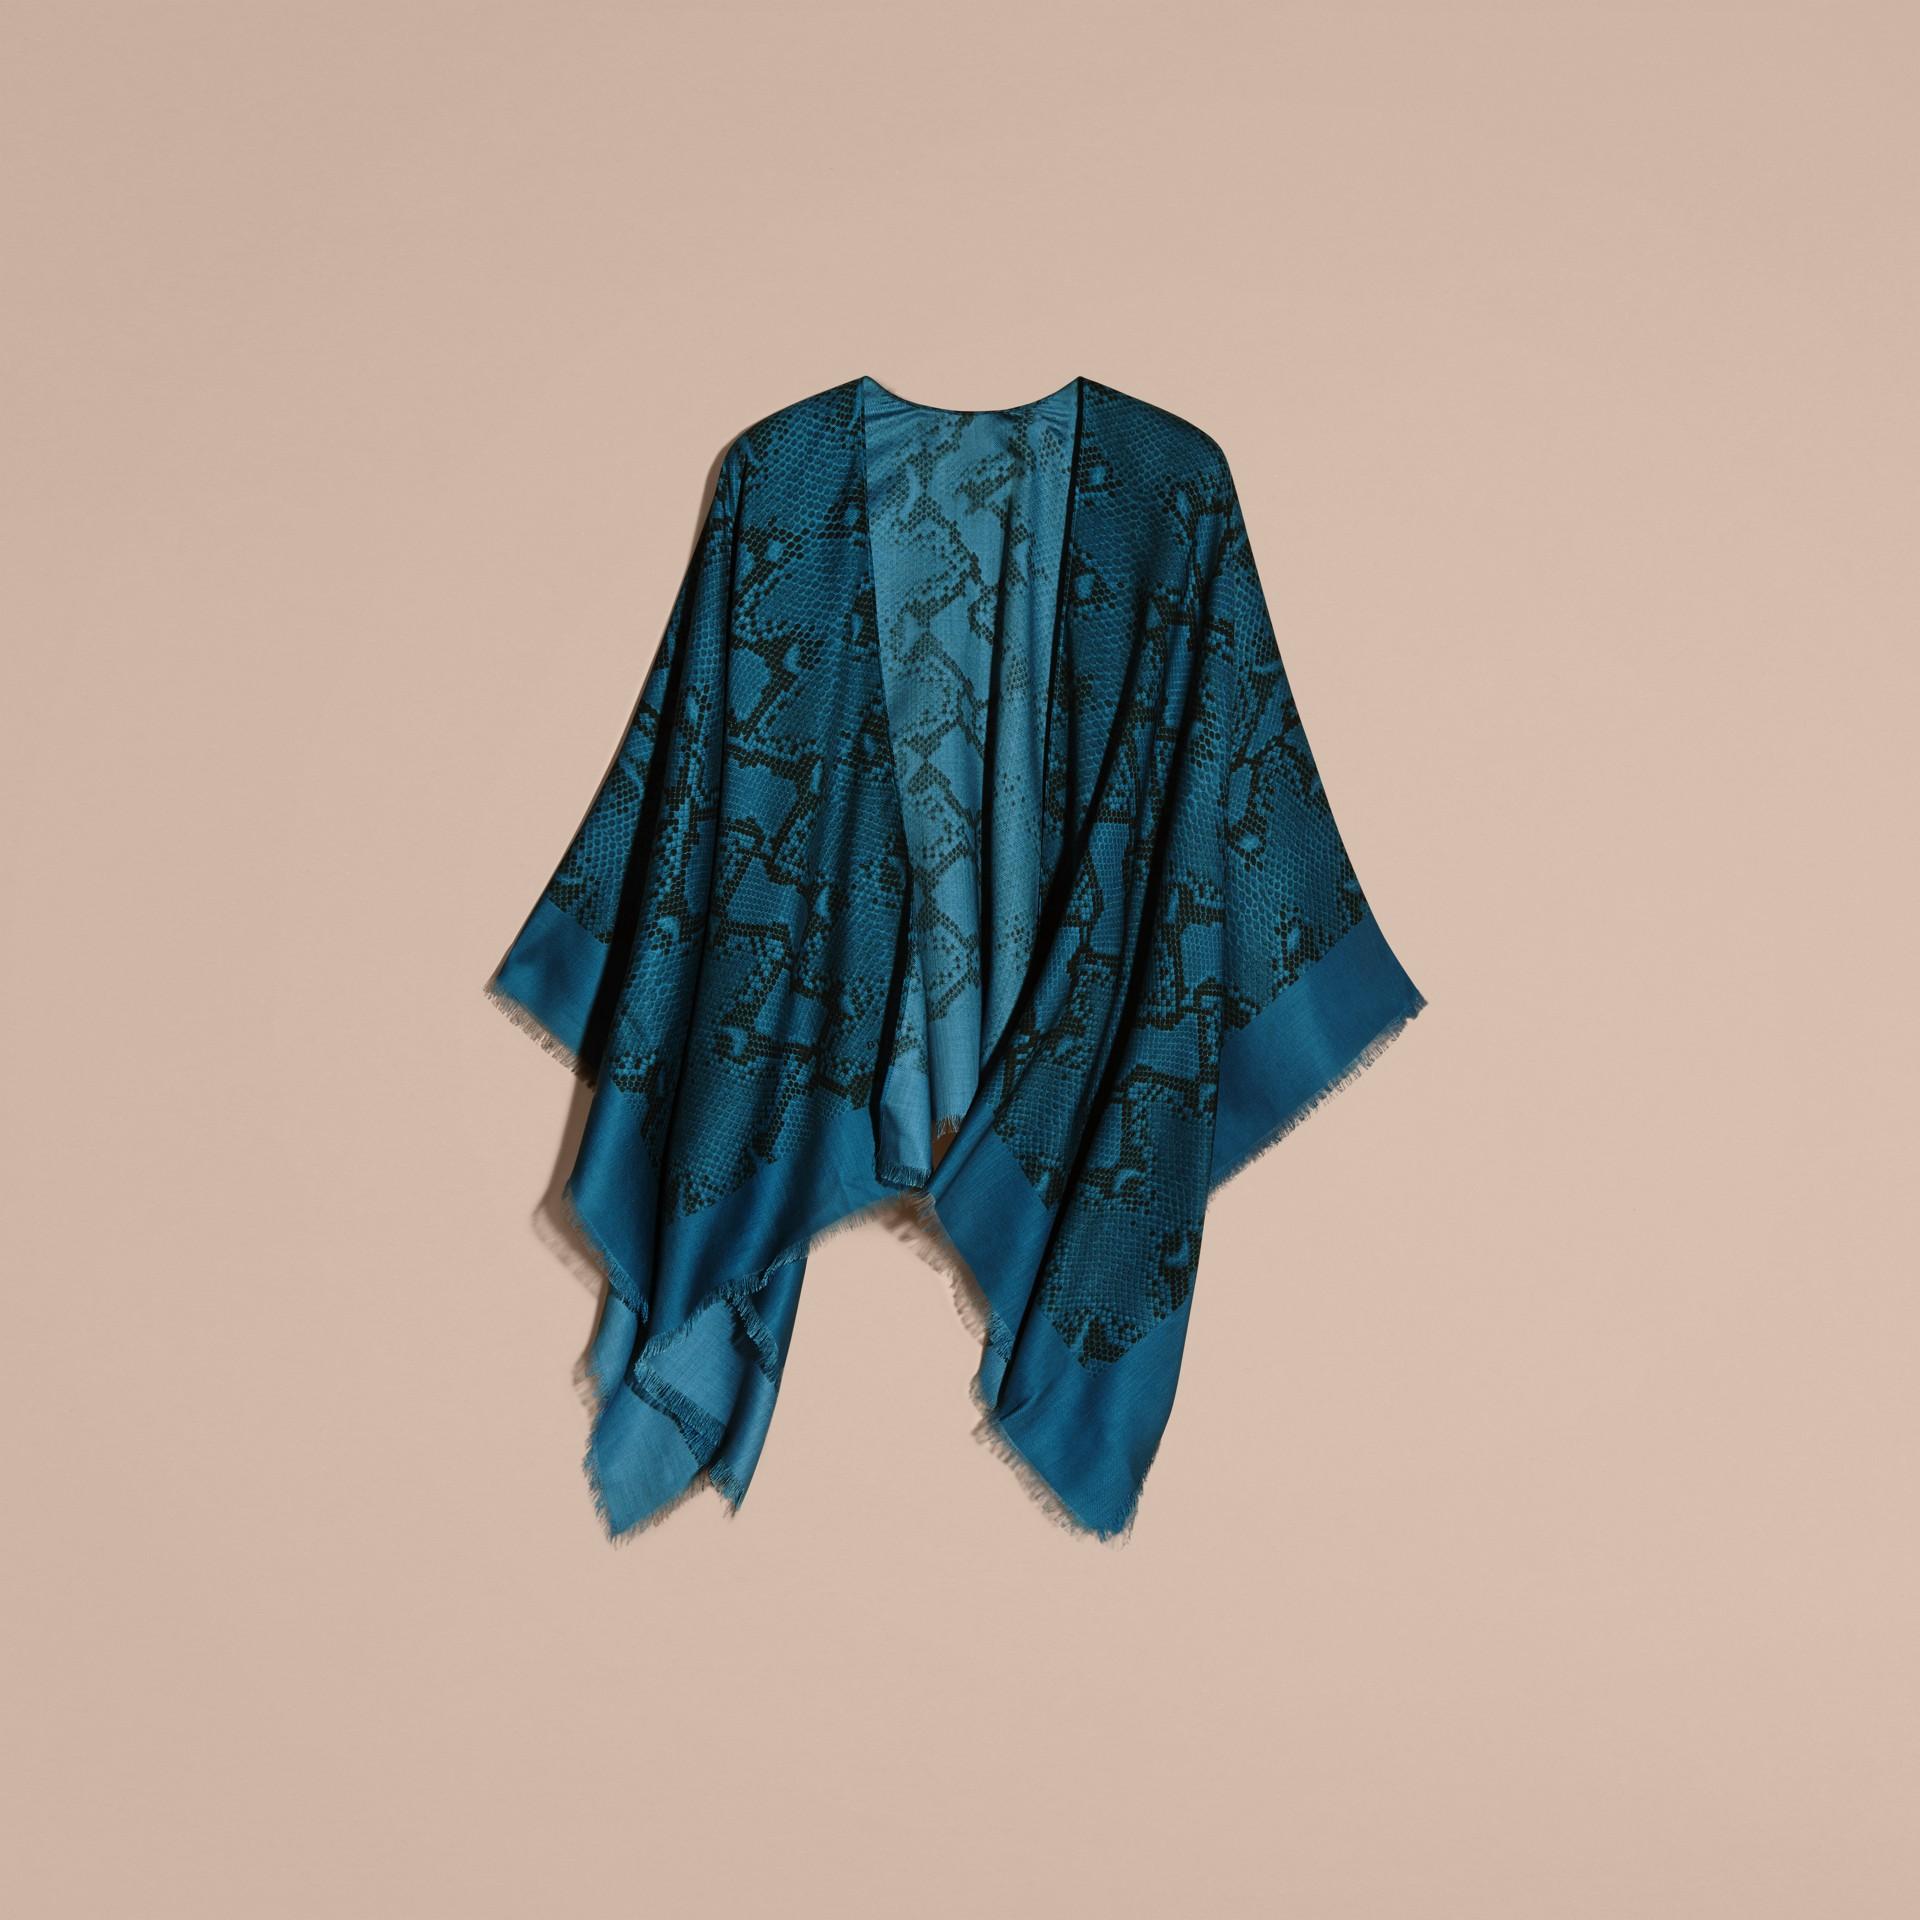 Mineral blue Poncho leve de lã, seda e cashmere com estampa de píton Mineral Blue - galeria de imagens 4